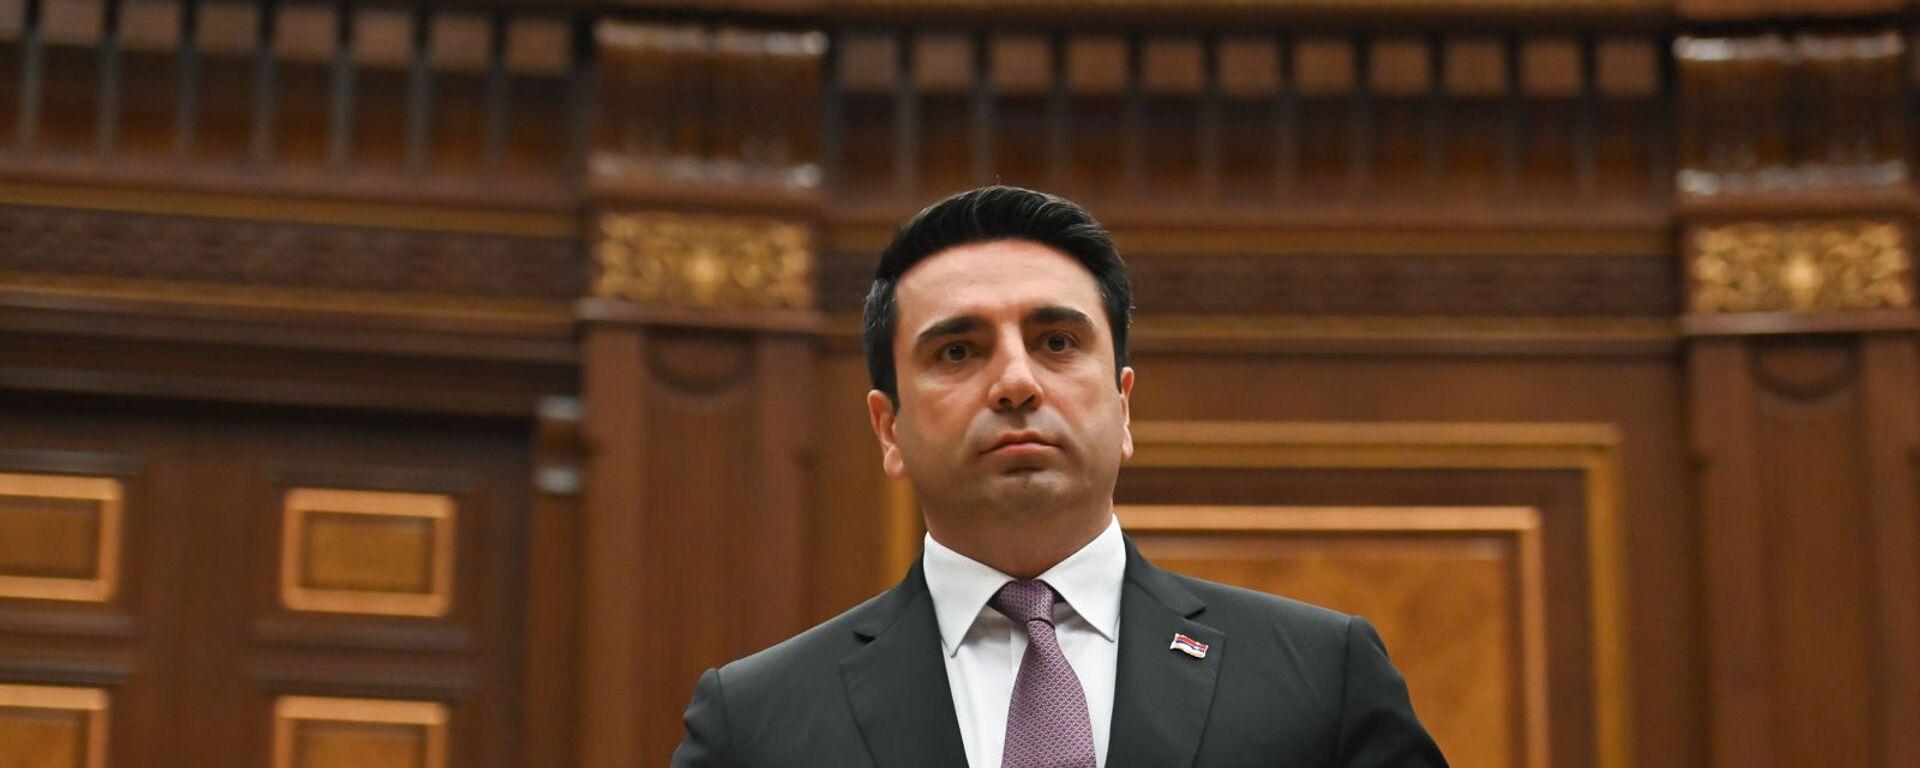 Ален Симонян во время первого заседания парламента Армении 8-го созыва (2 августа 2021). Еревaн - Sputnik Արմենիա, 1920, 04.08.2021